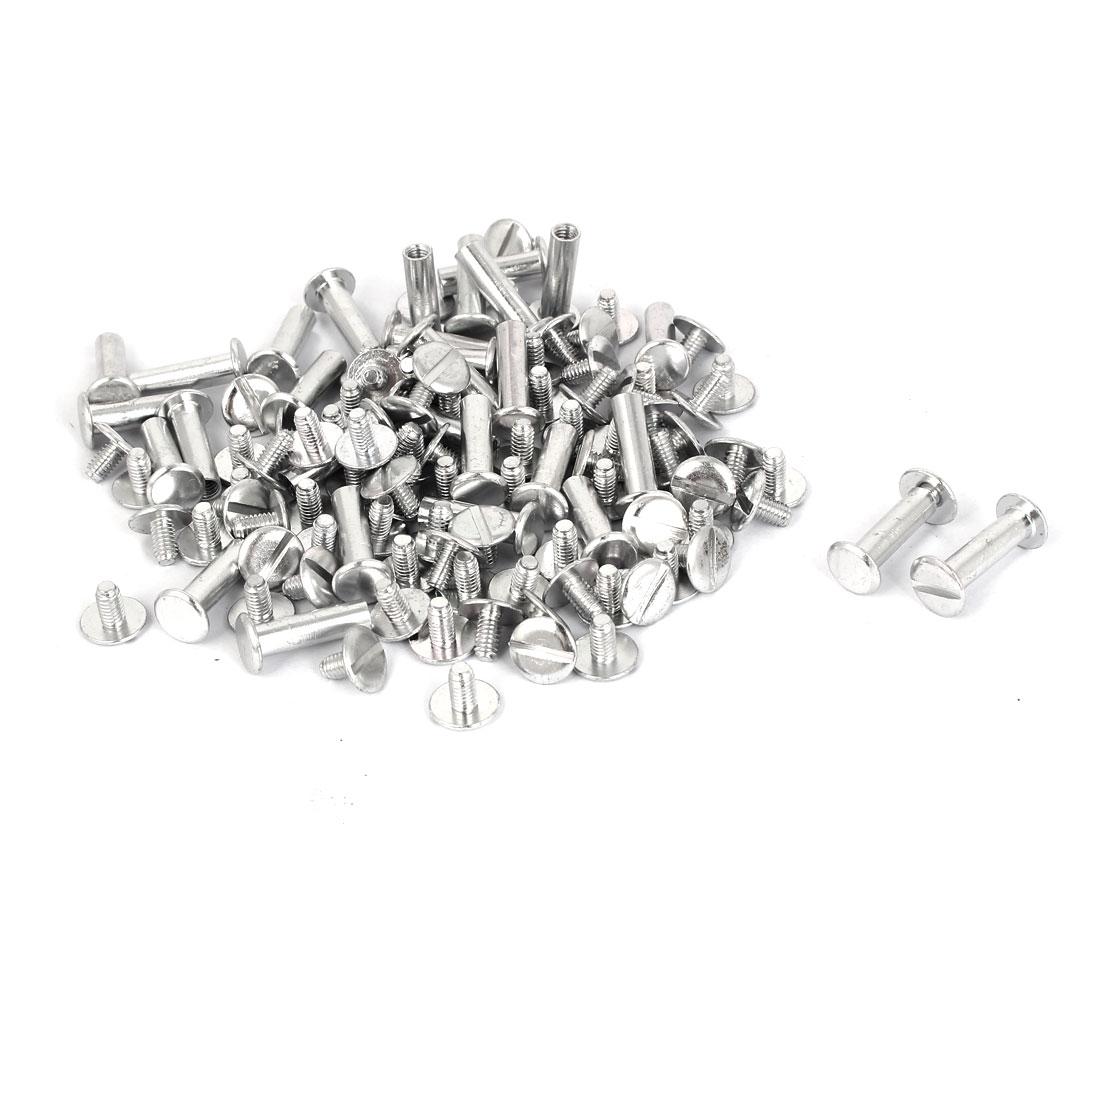 M5x18mm Aluminum Chicago Screws Binding Posts Silver Tone 50pcs